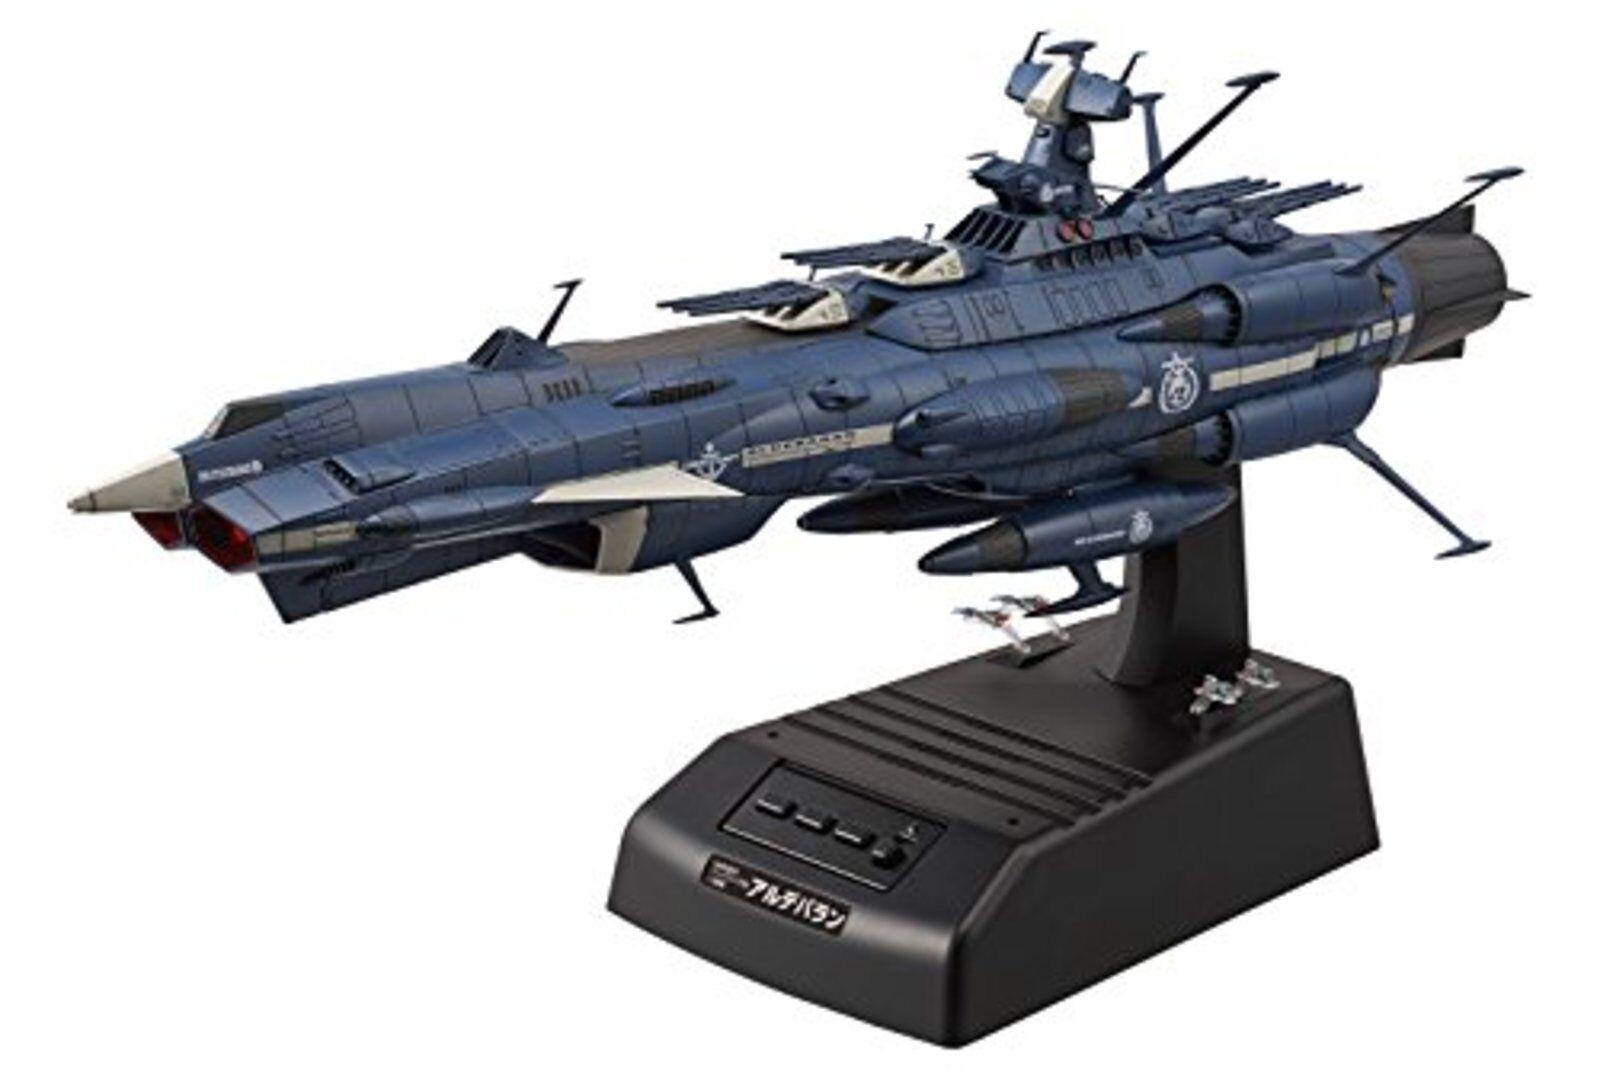 Espace Cuirassé Yamato 2202 1 1000 Aldebaran Film effet ver. F S AVEC Nº DE SUIVI